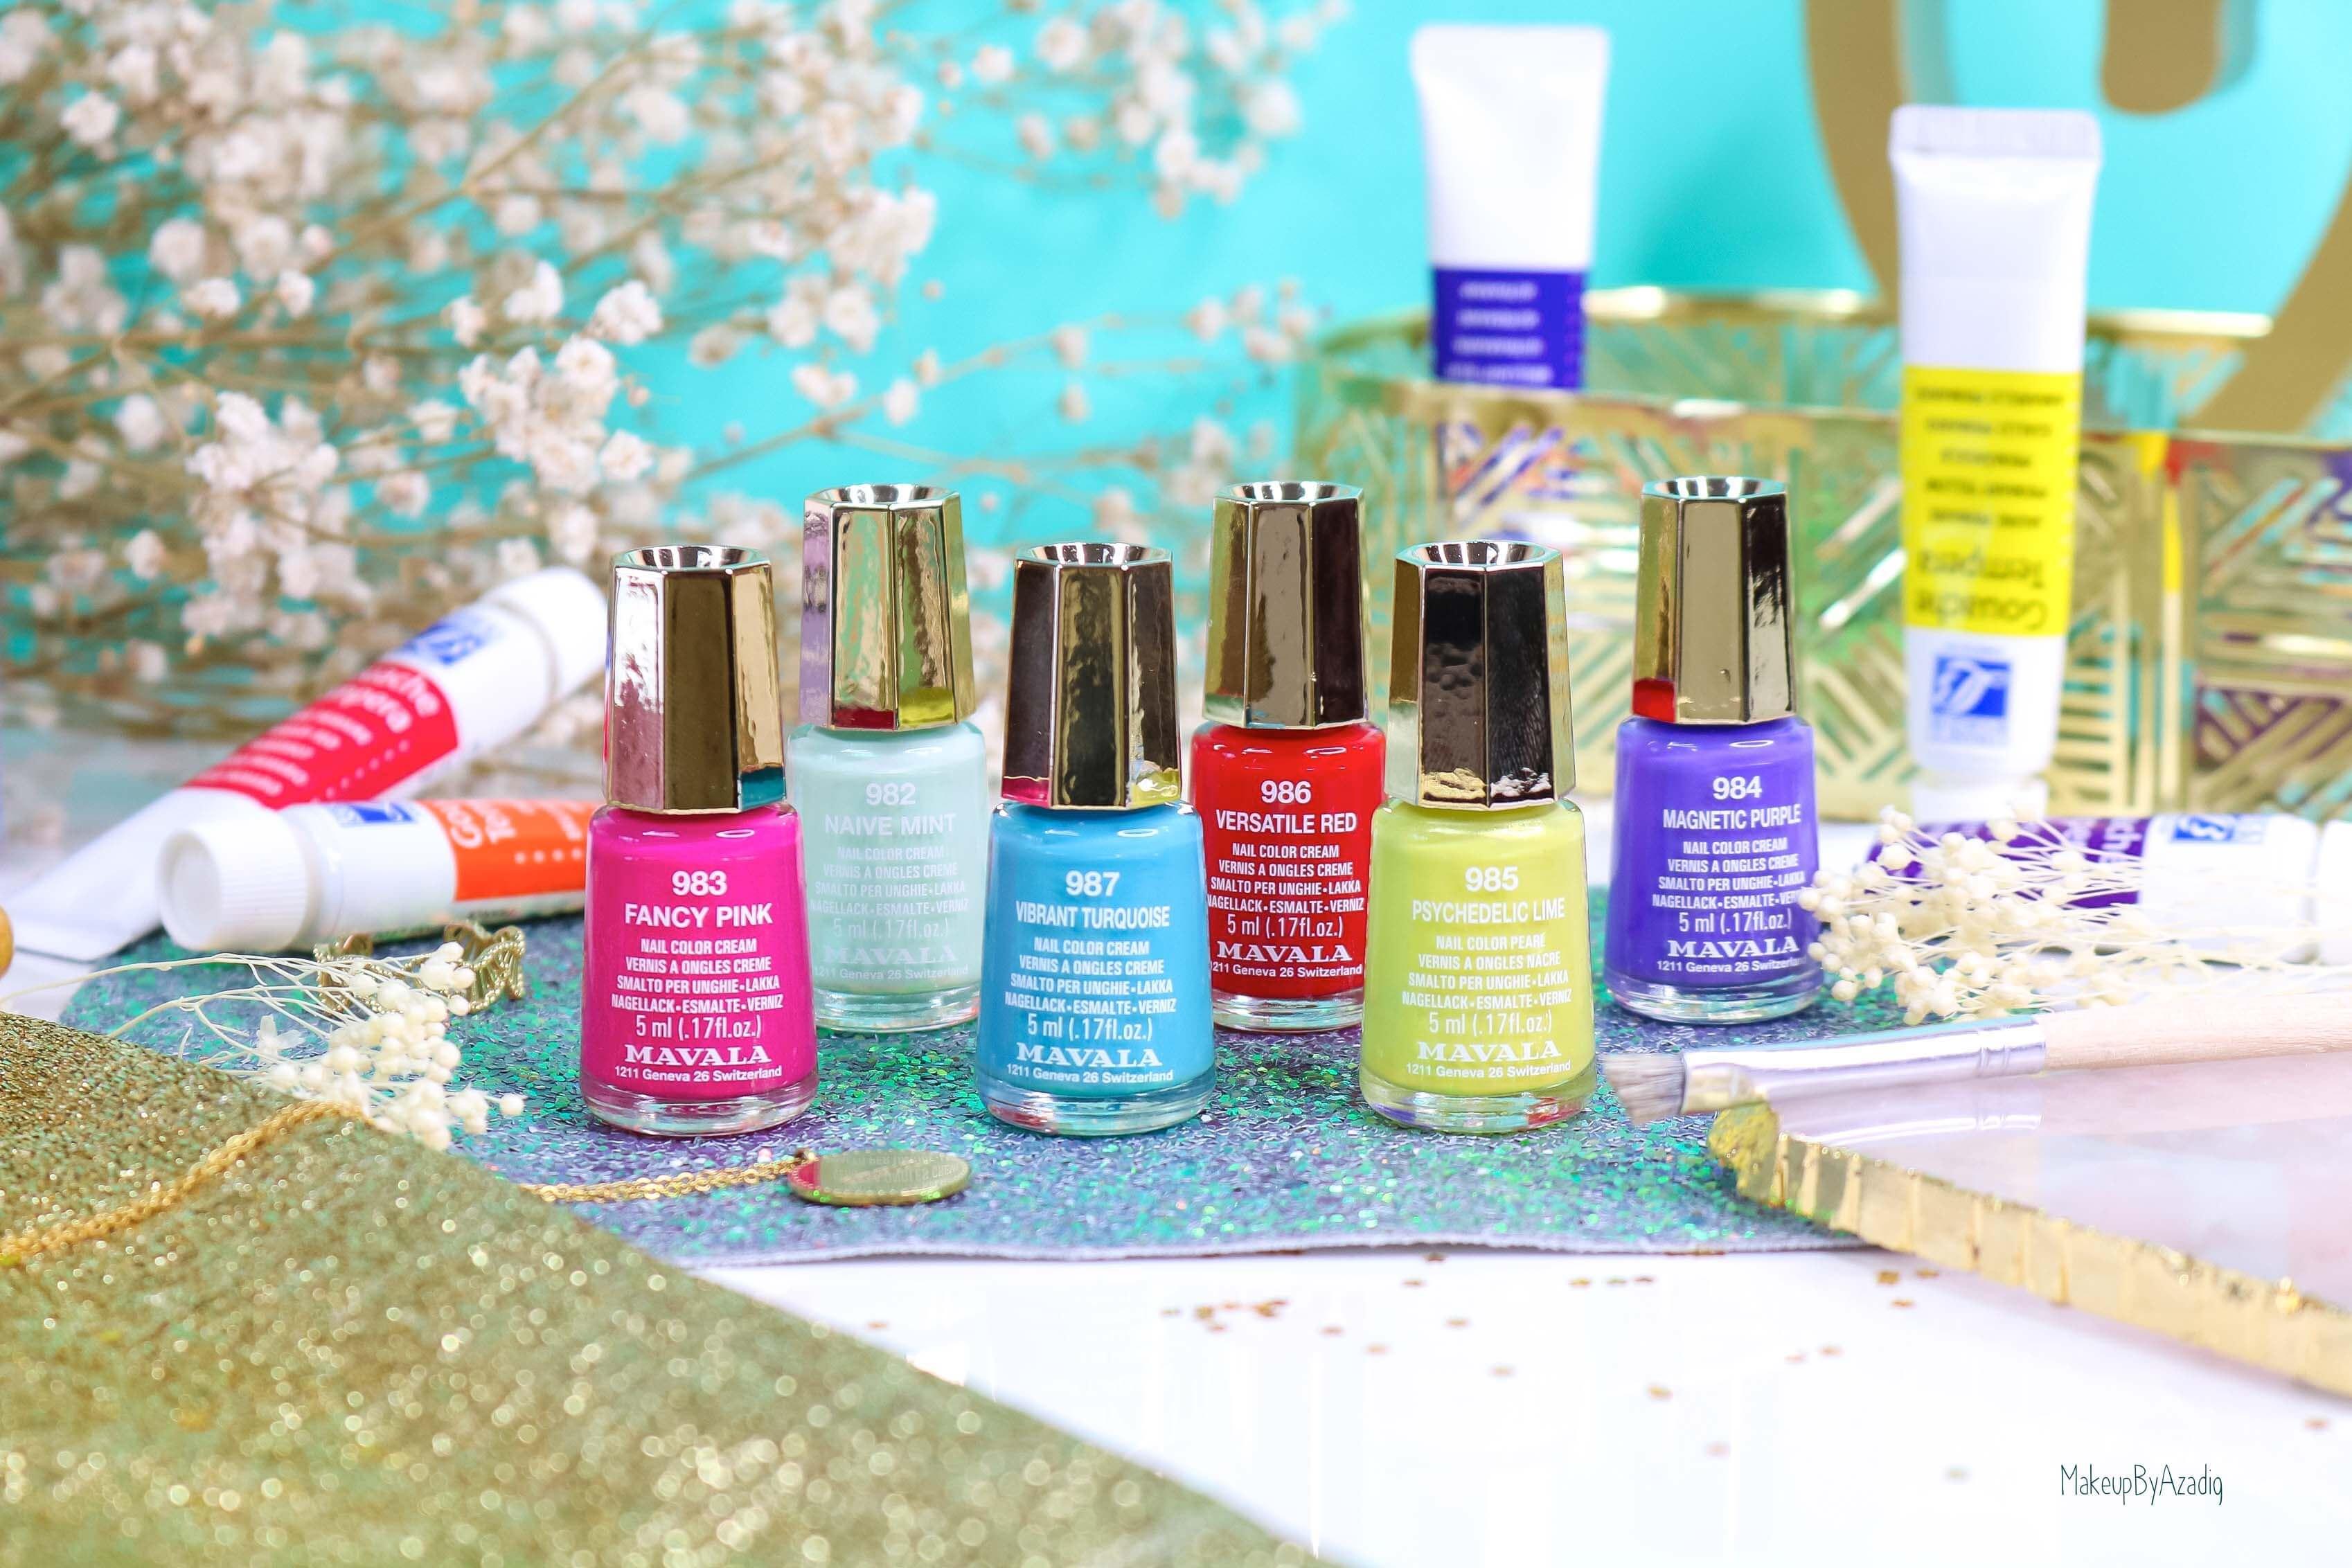 revue-collection-vernis-mavala-nails-dash-splash-ete-2019-bleu-orange-makeupbyazadig-swatch-avis-prix-colors